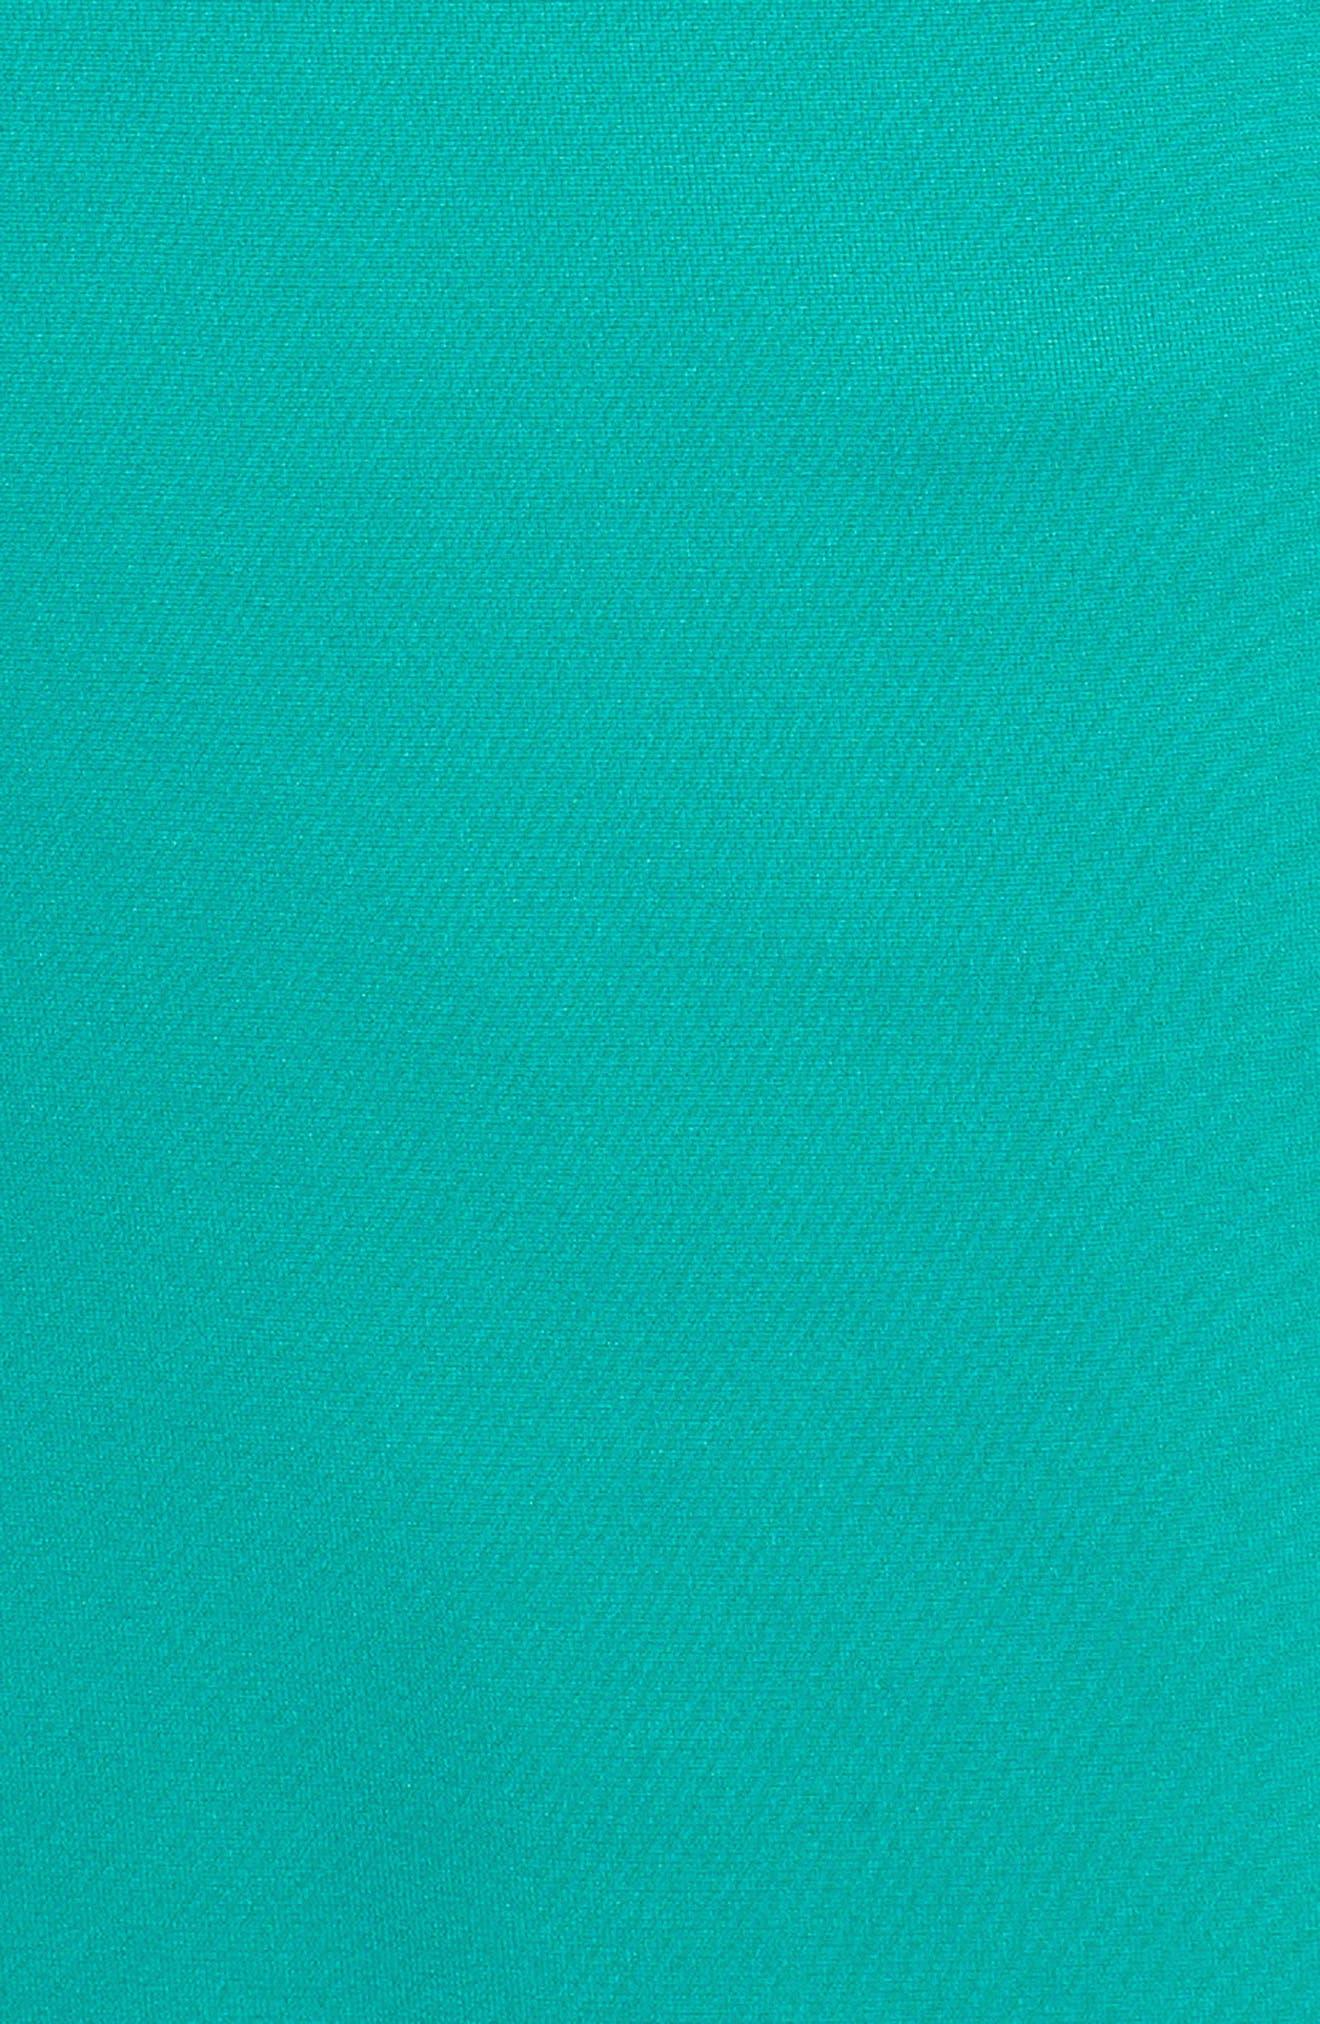 Mk1 Inset Fade Shorts,                             Alternate thumbnail 5, color,                             SWALLOWTAIL / TIDE / GREY